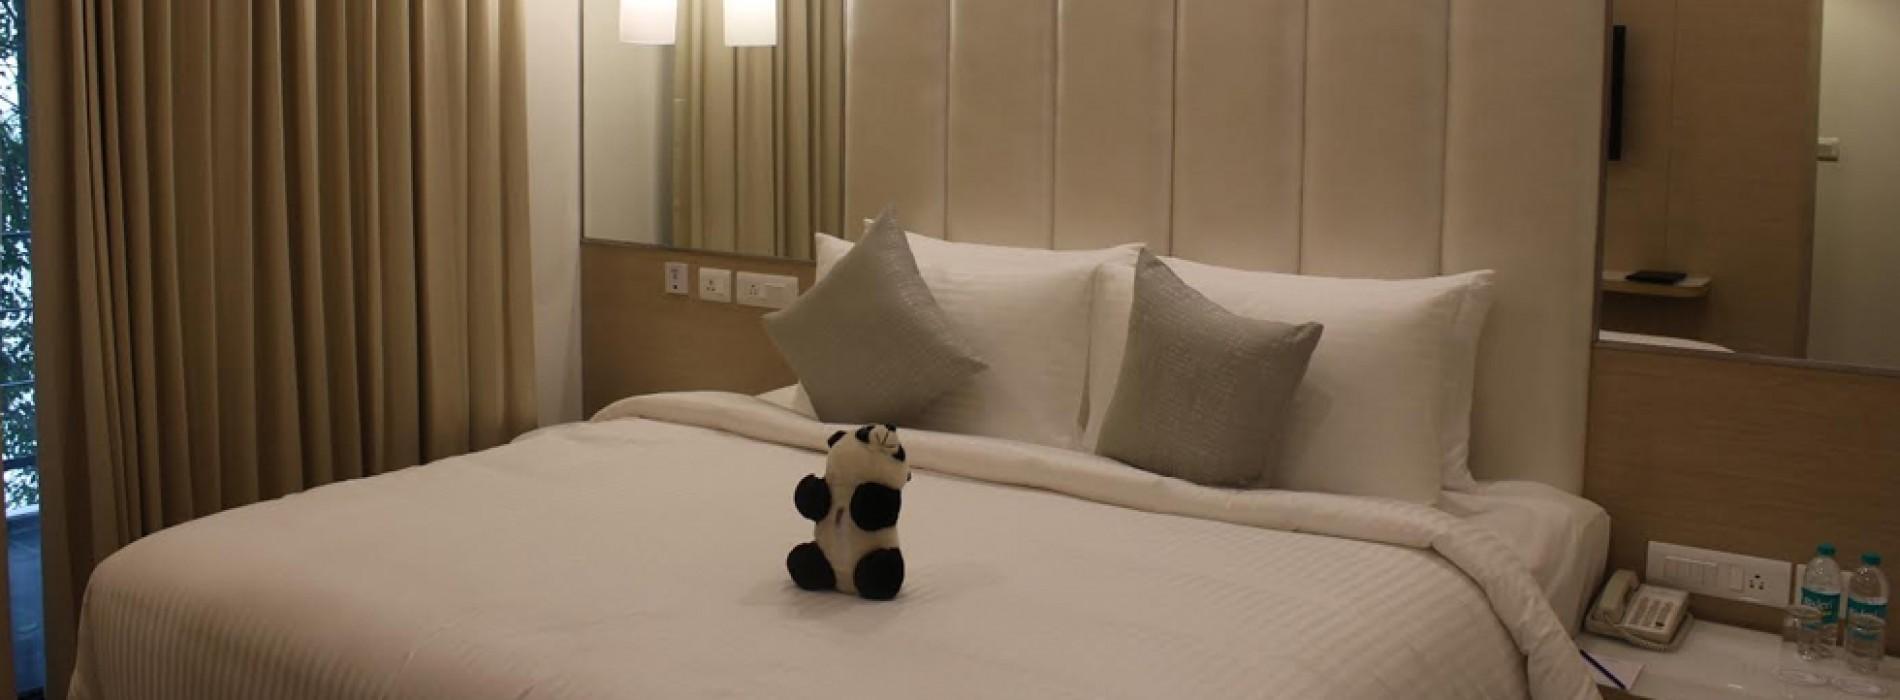 Sarovar Hotels Pvt. Ltd. opens RBD Sarovar Portico